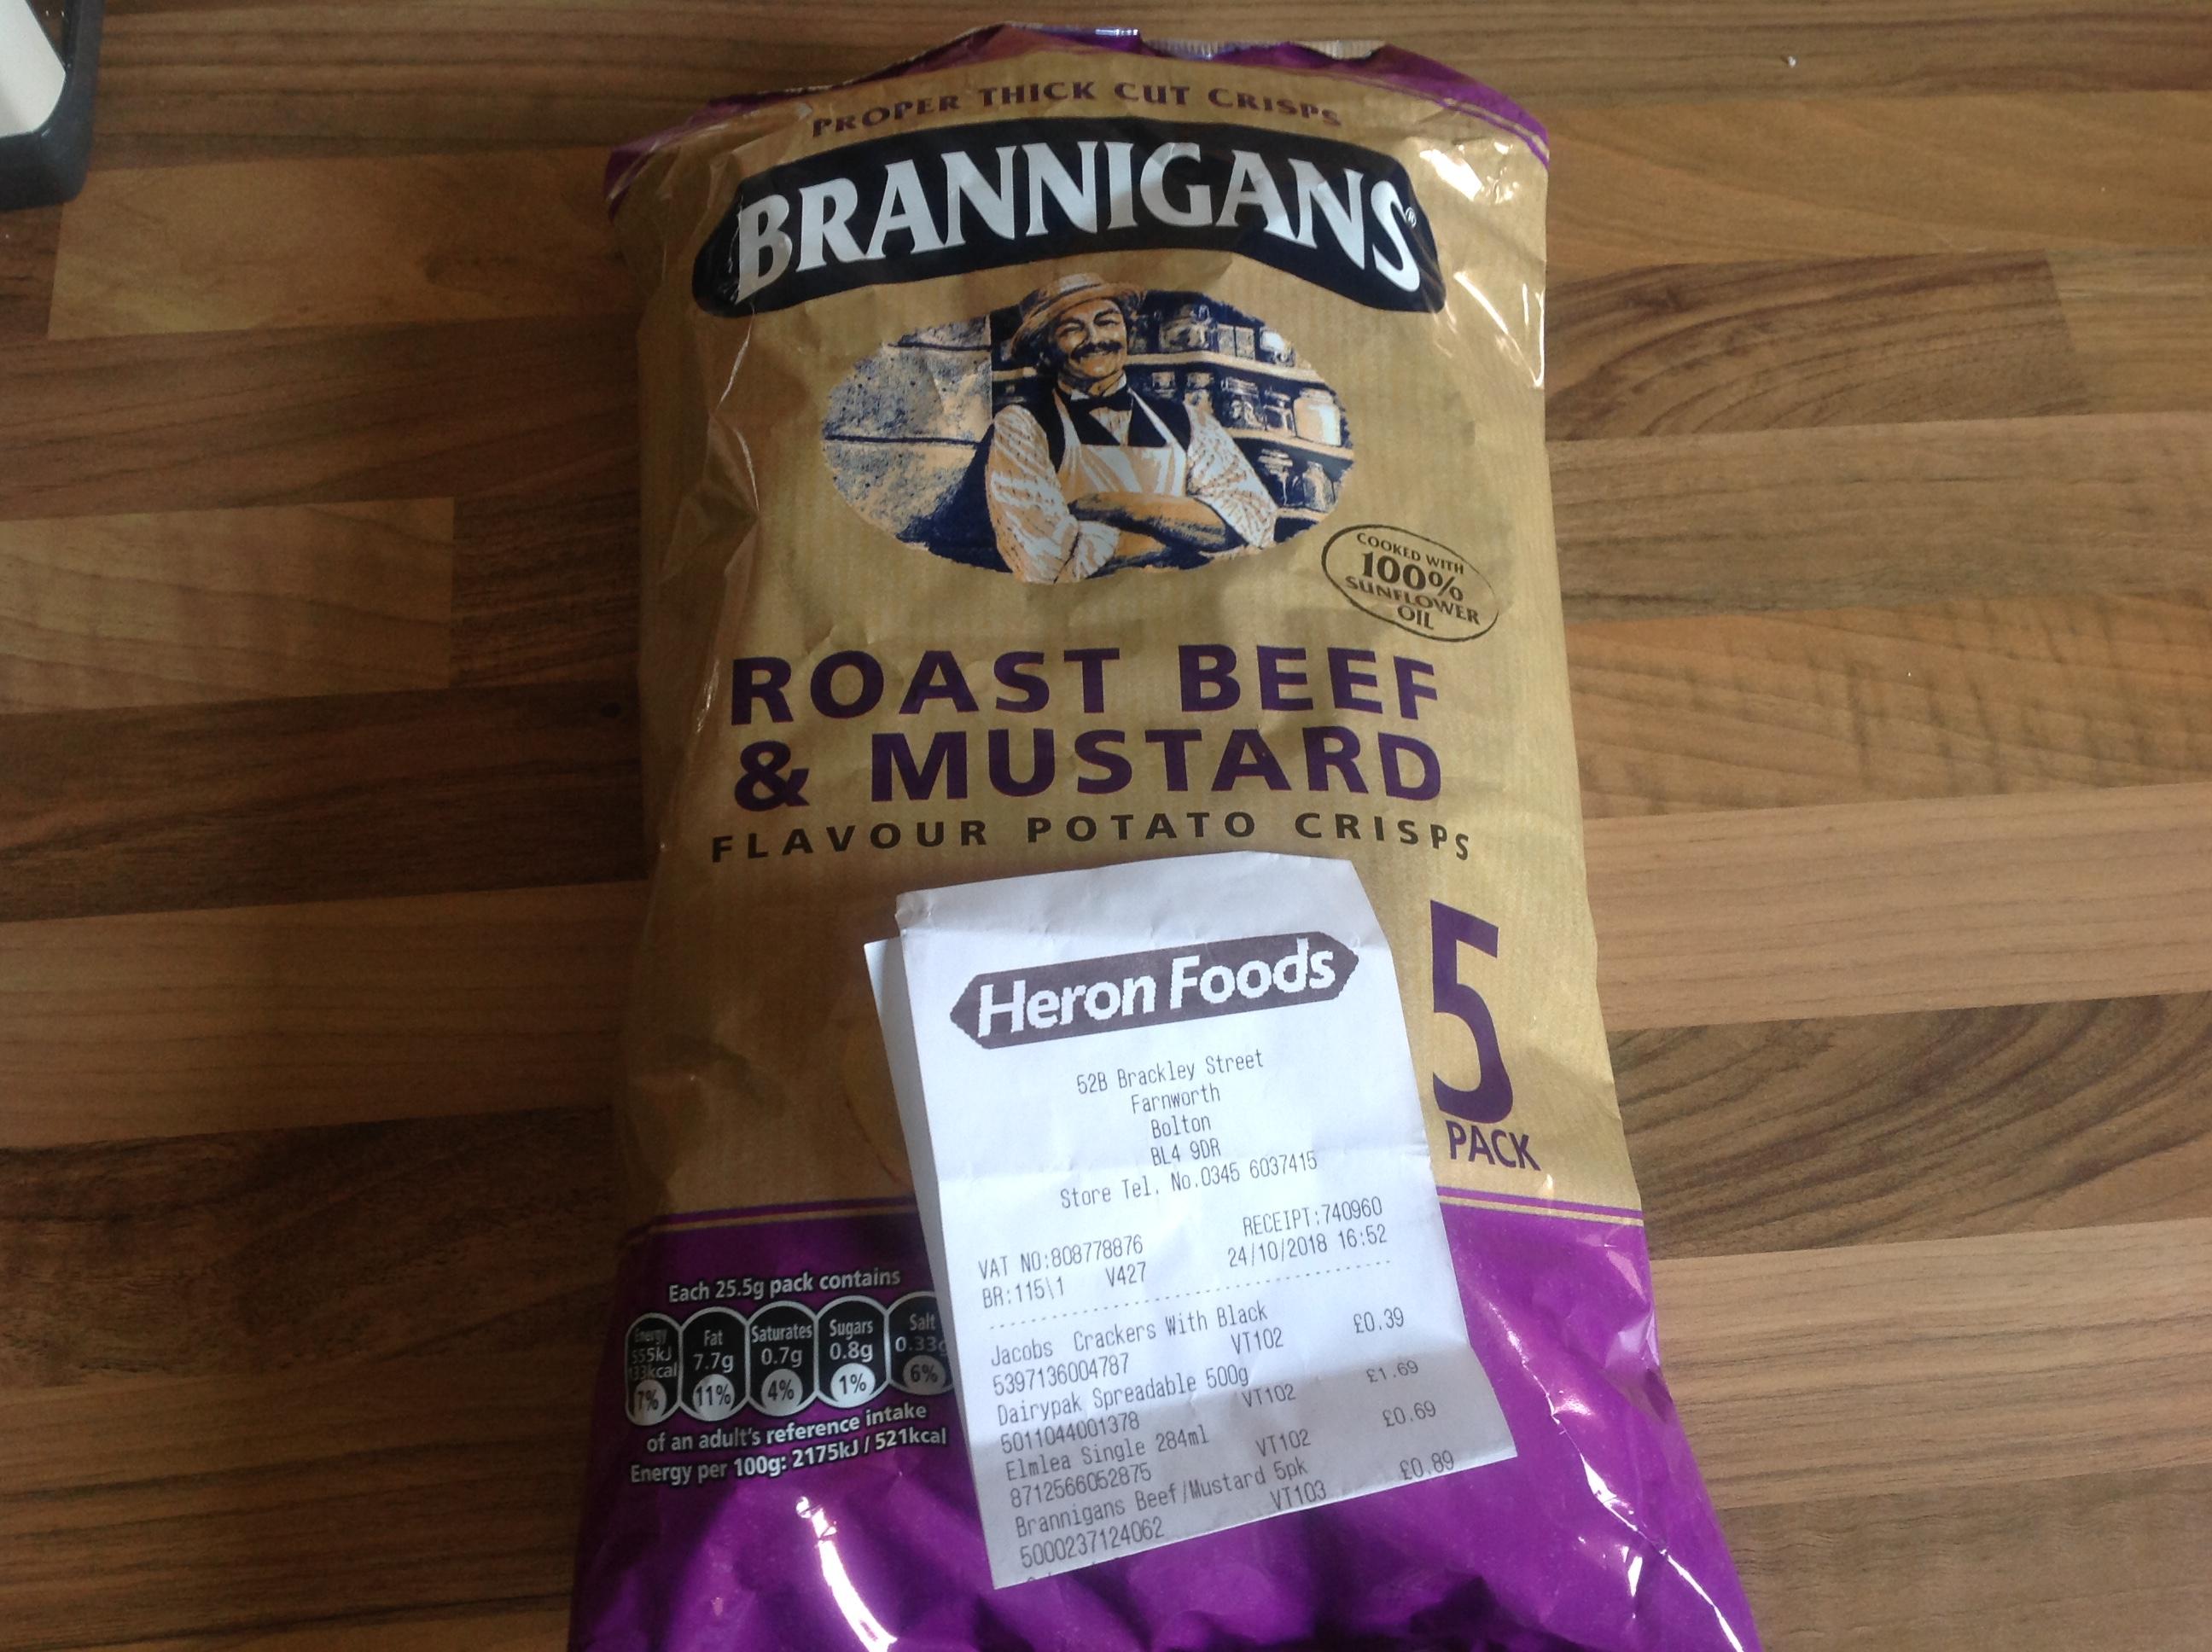 Brannigans Roast Beef & Mustard crisps 5 x 25.5g pack, 89p Heron - Farnworth store.